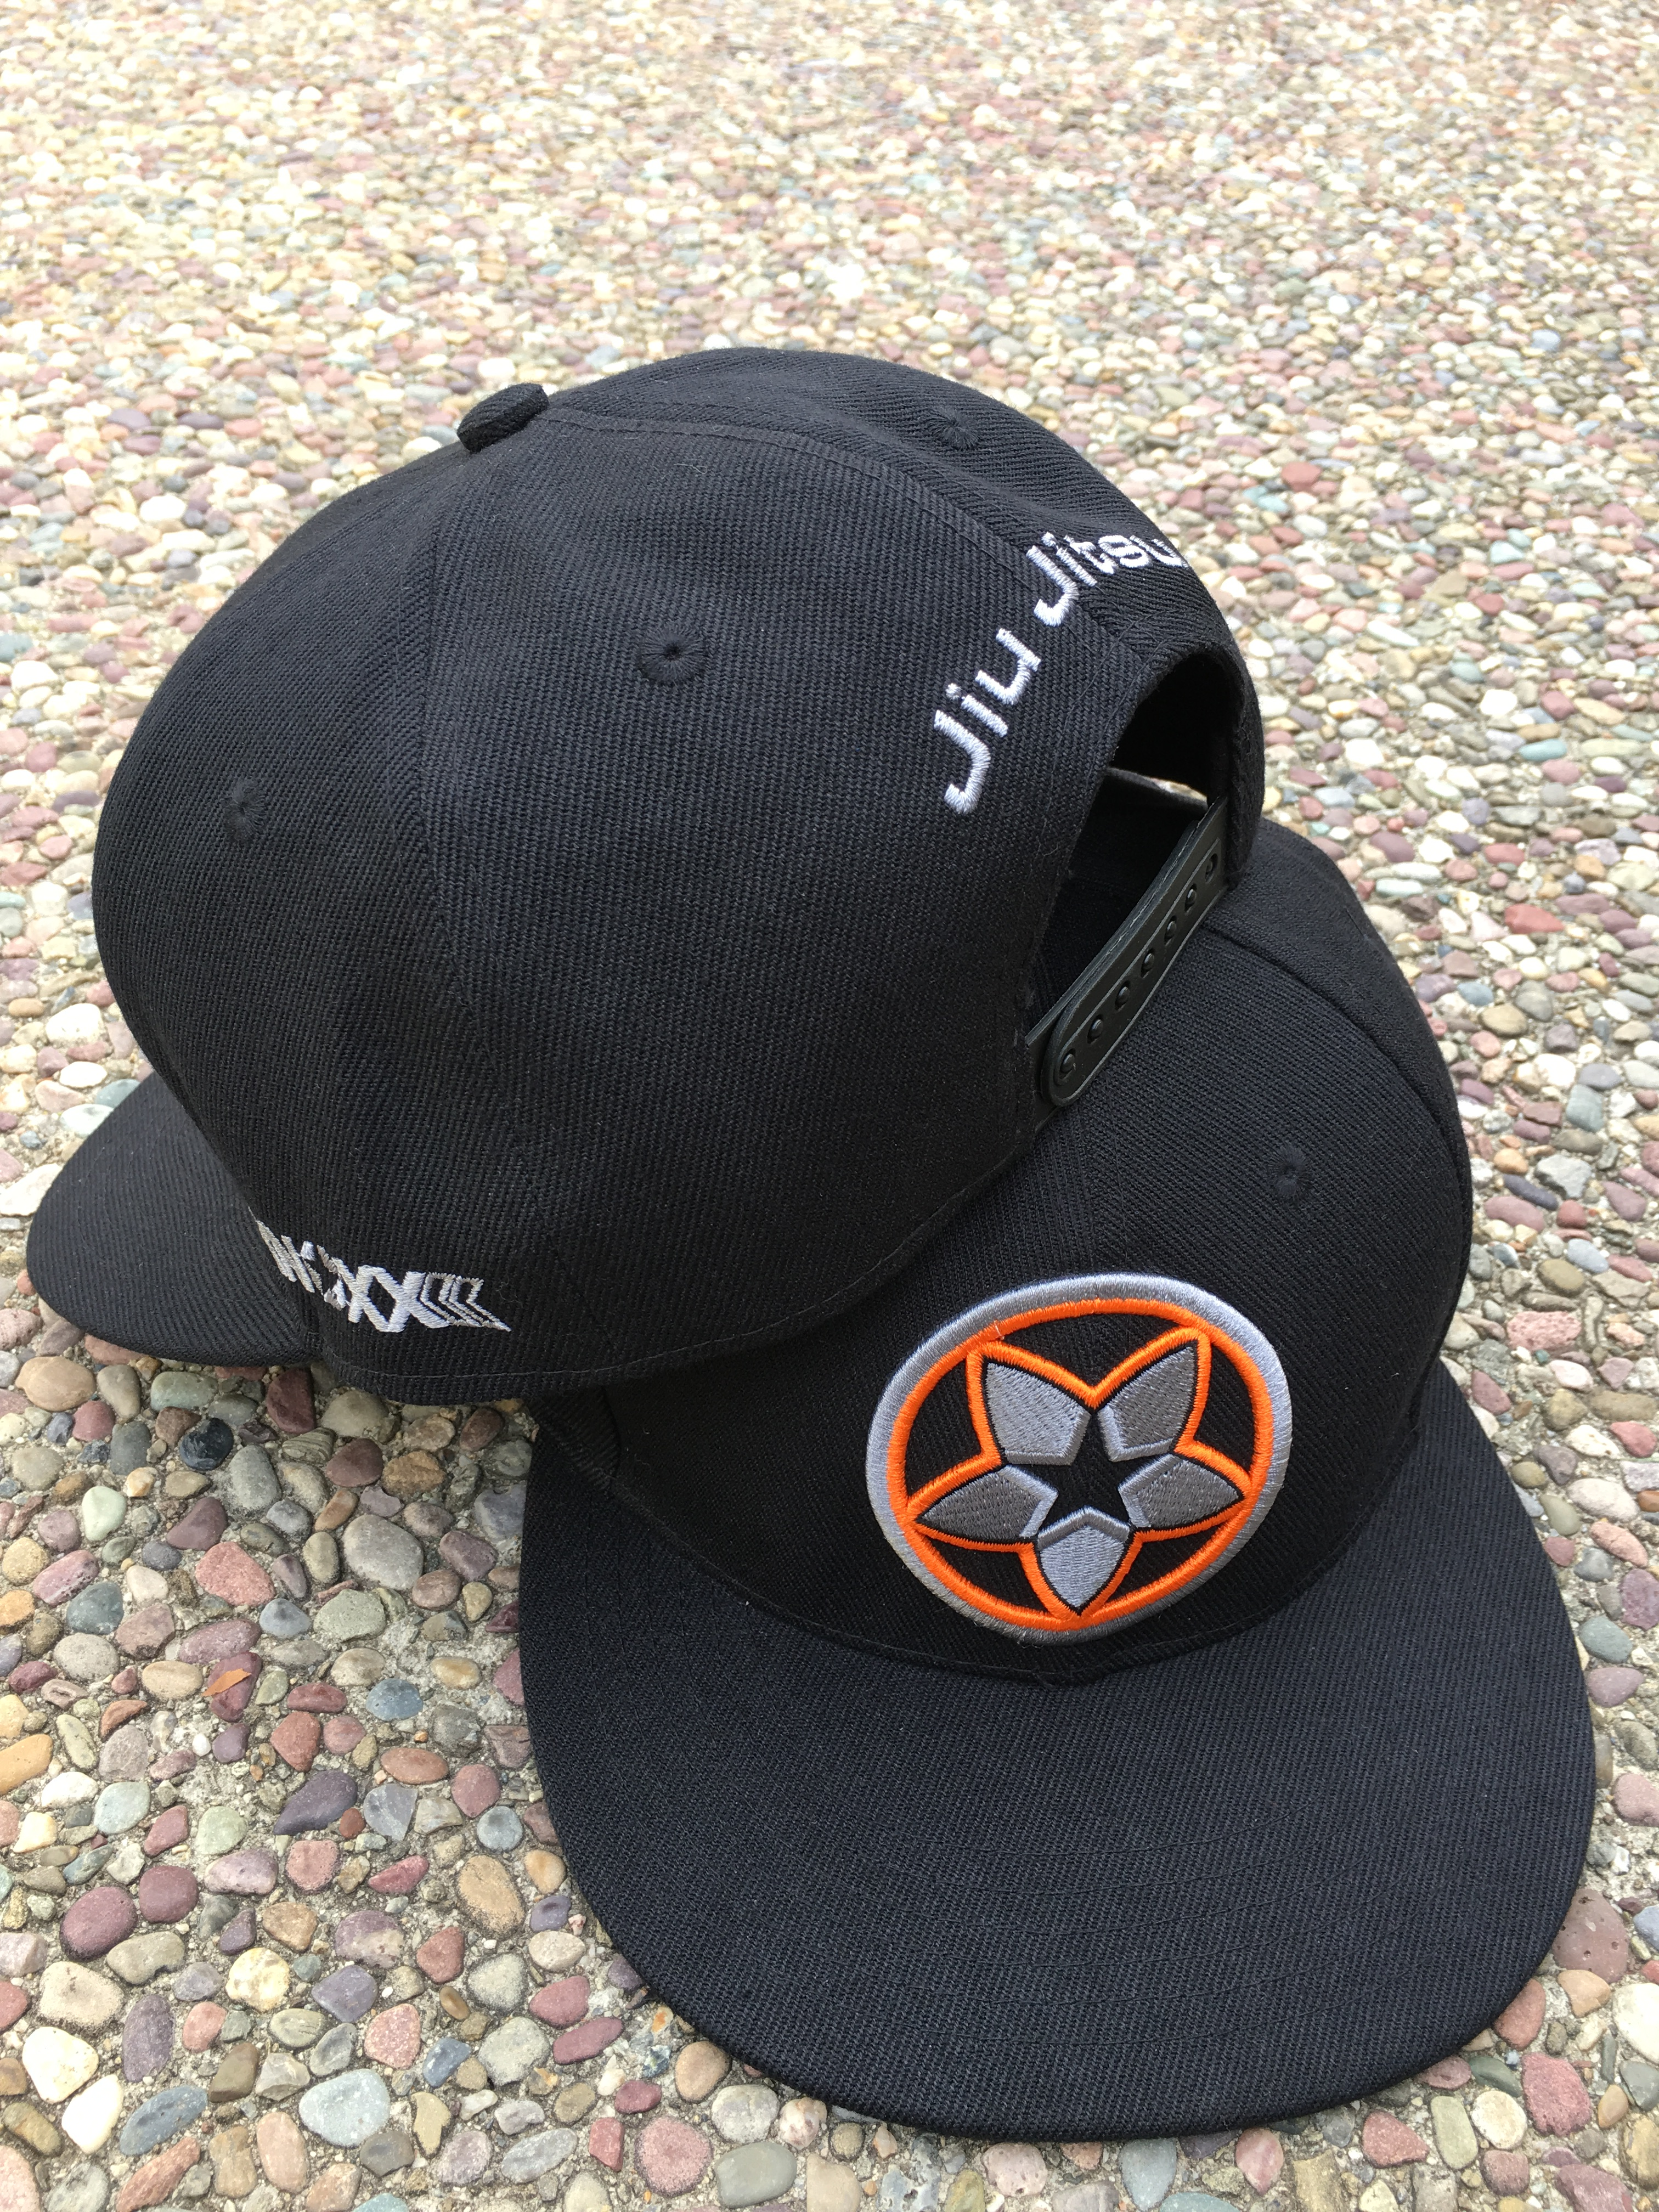 knoxx jiu jitsu snapback caps.JPG